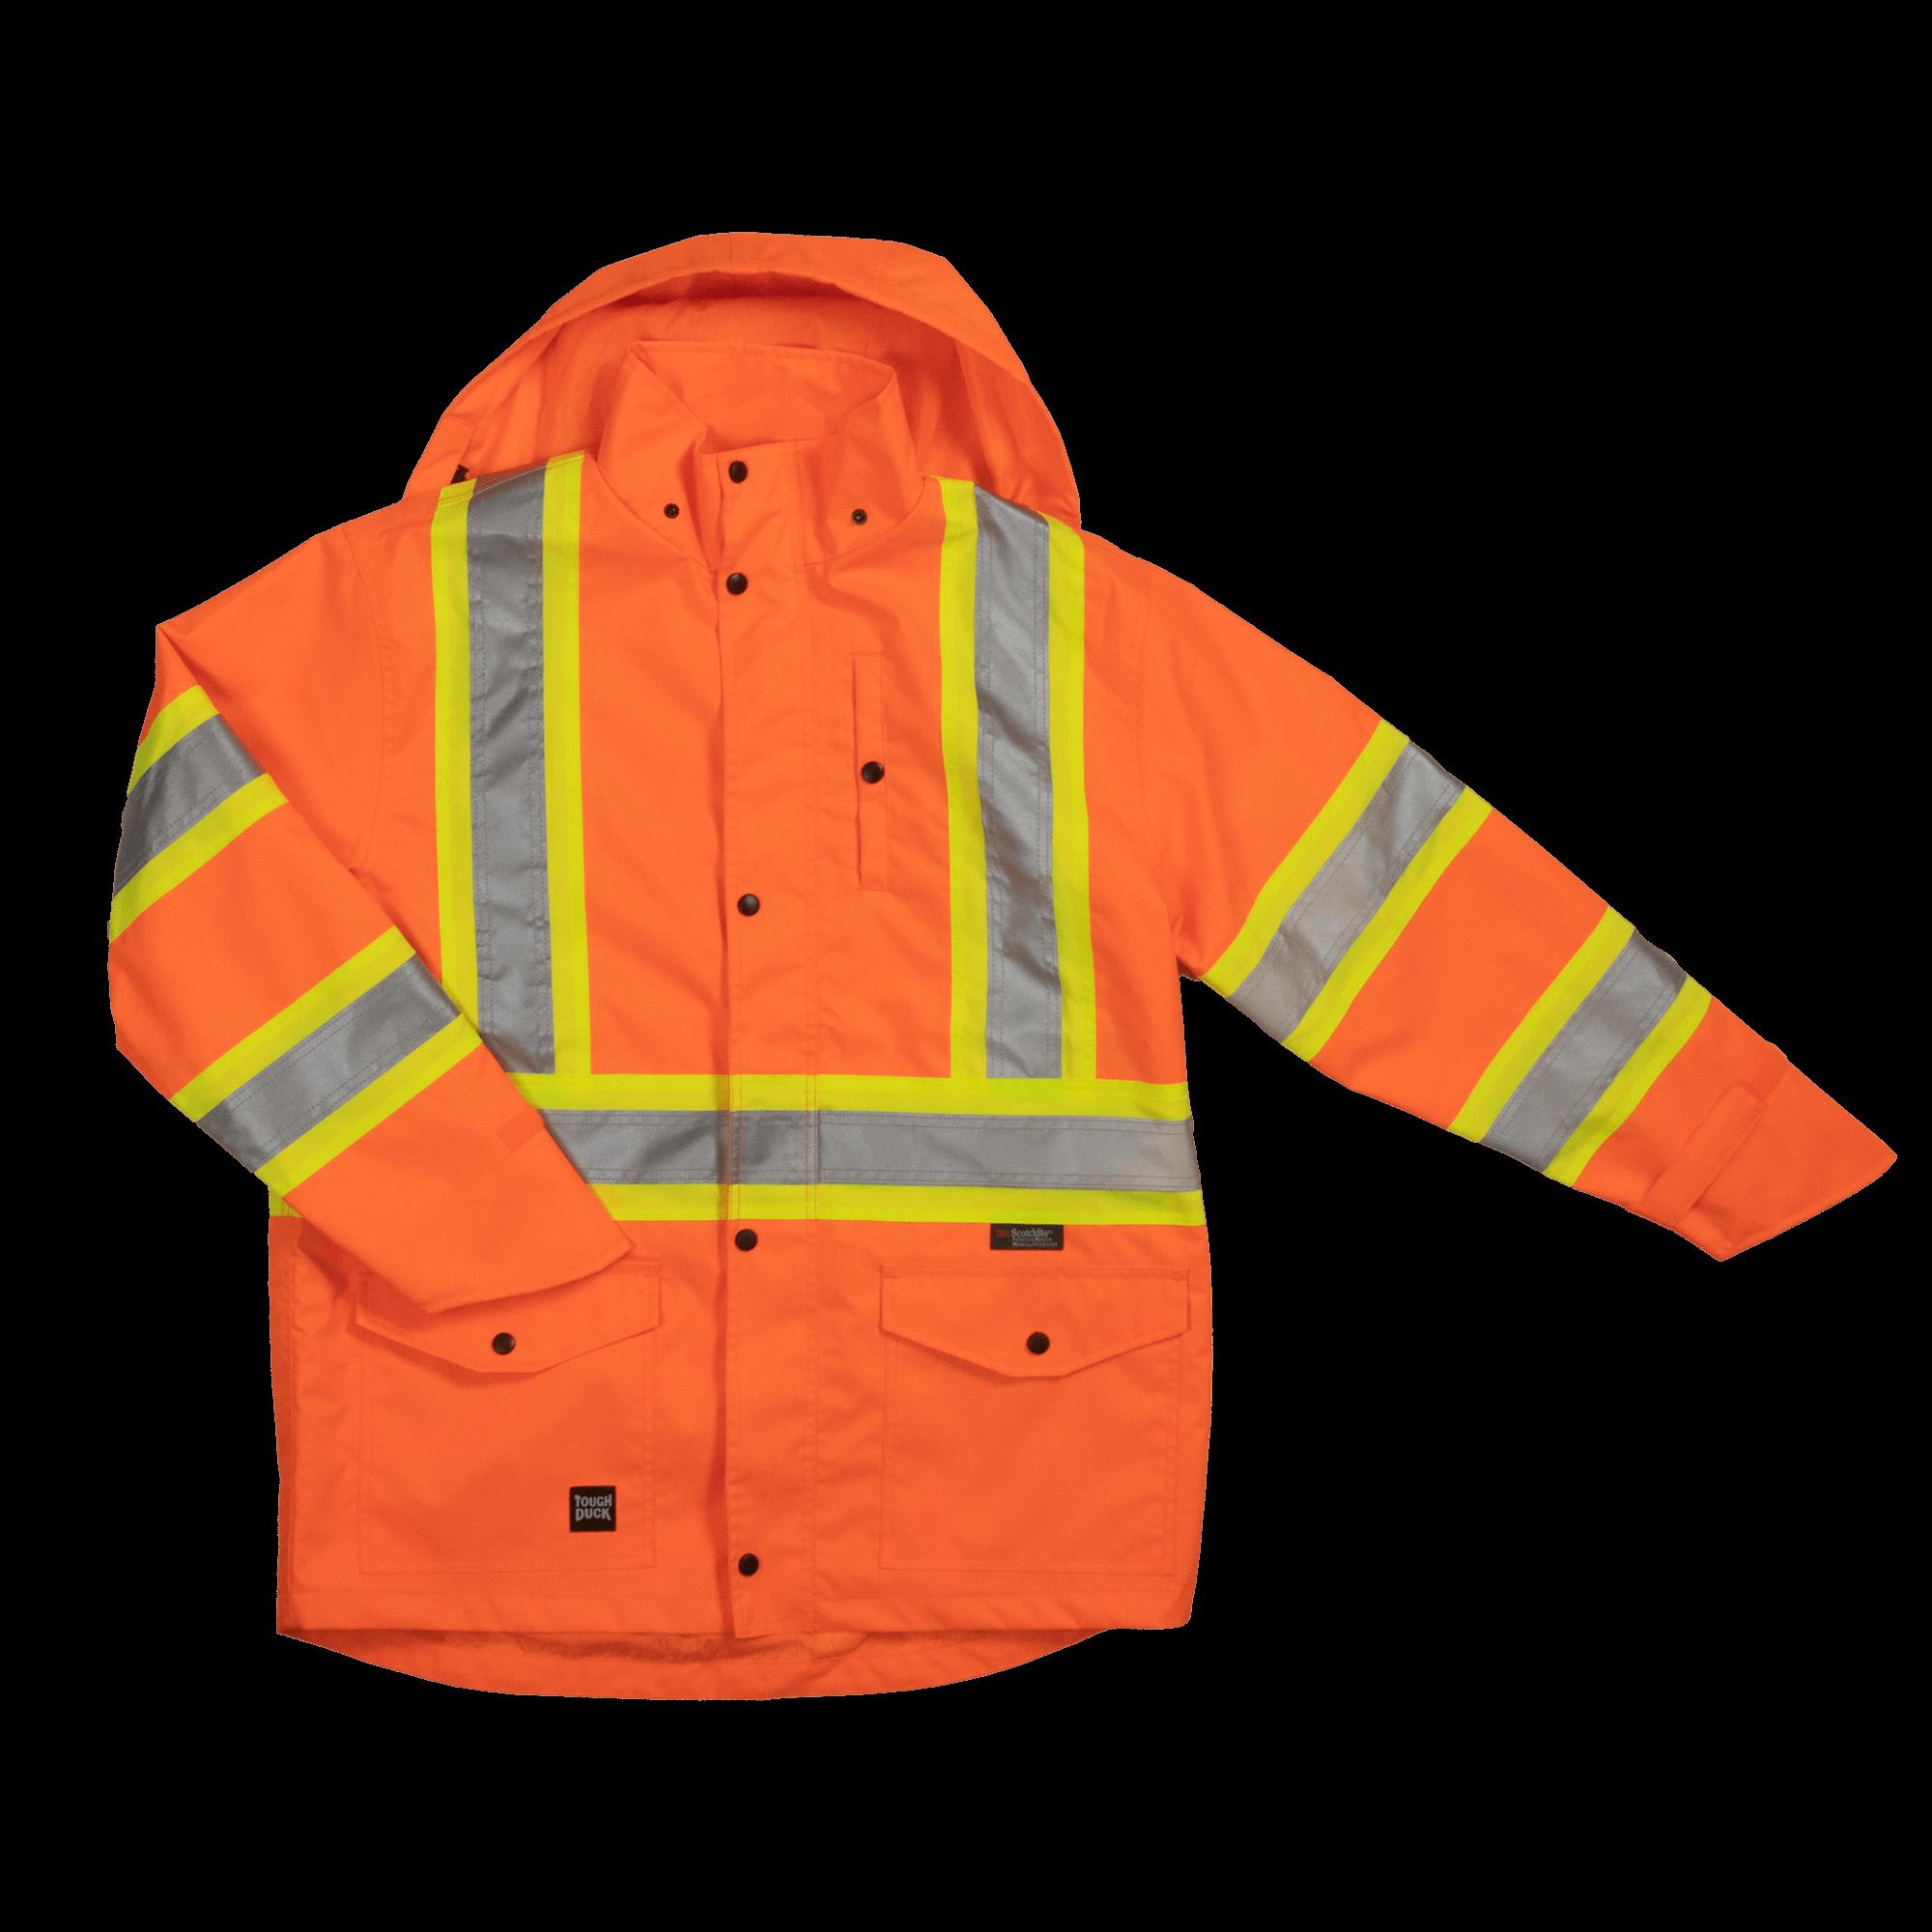 https://0901.nccdn.net/4_2/000/000/03f/ac7/sj35-flor-f-tough-duck-safety-rain-jacket-fluorescent-orange-fro.png